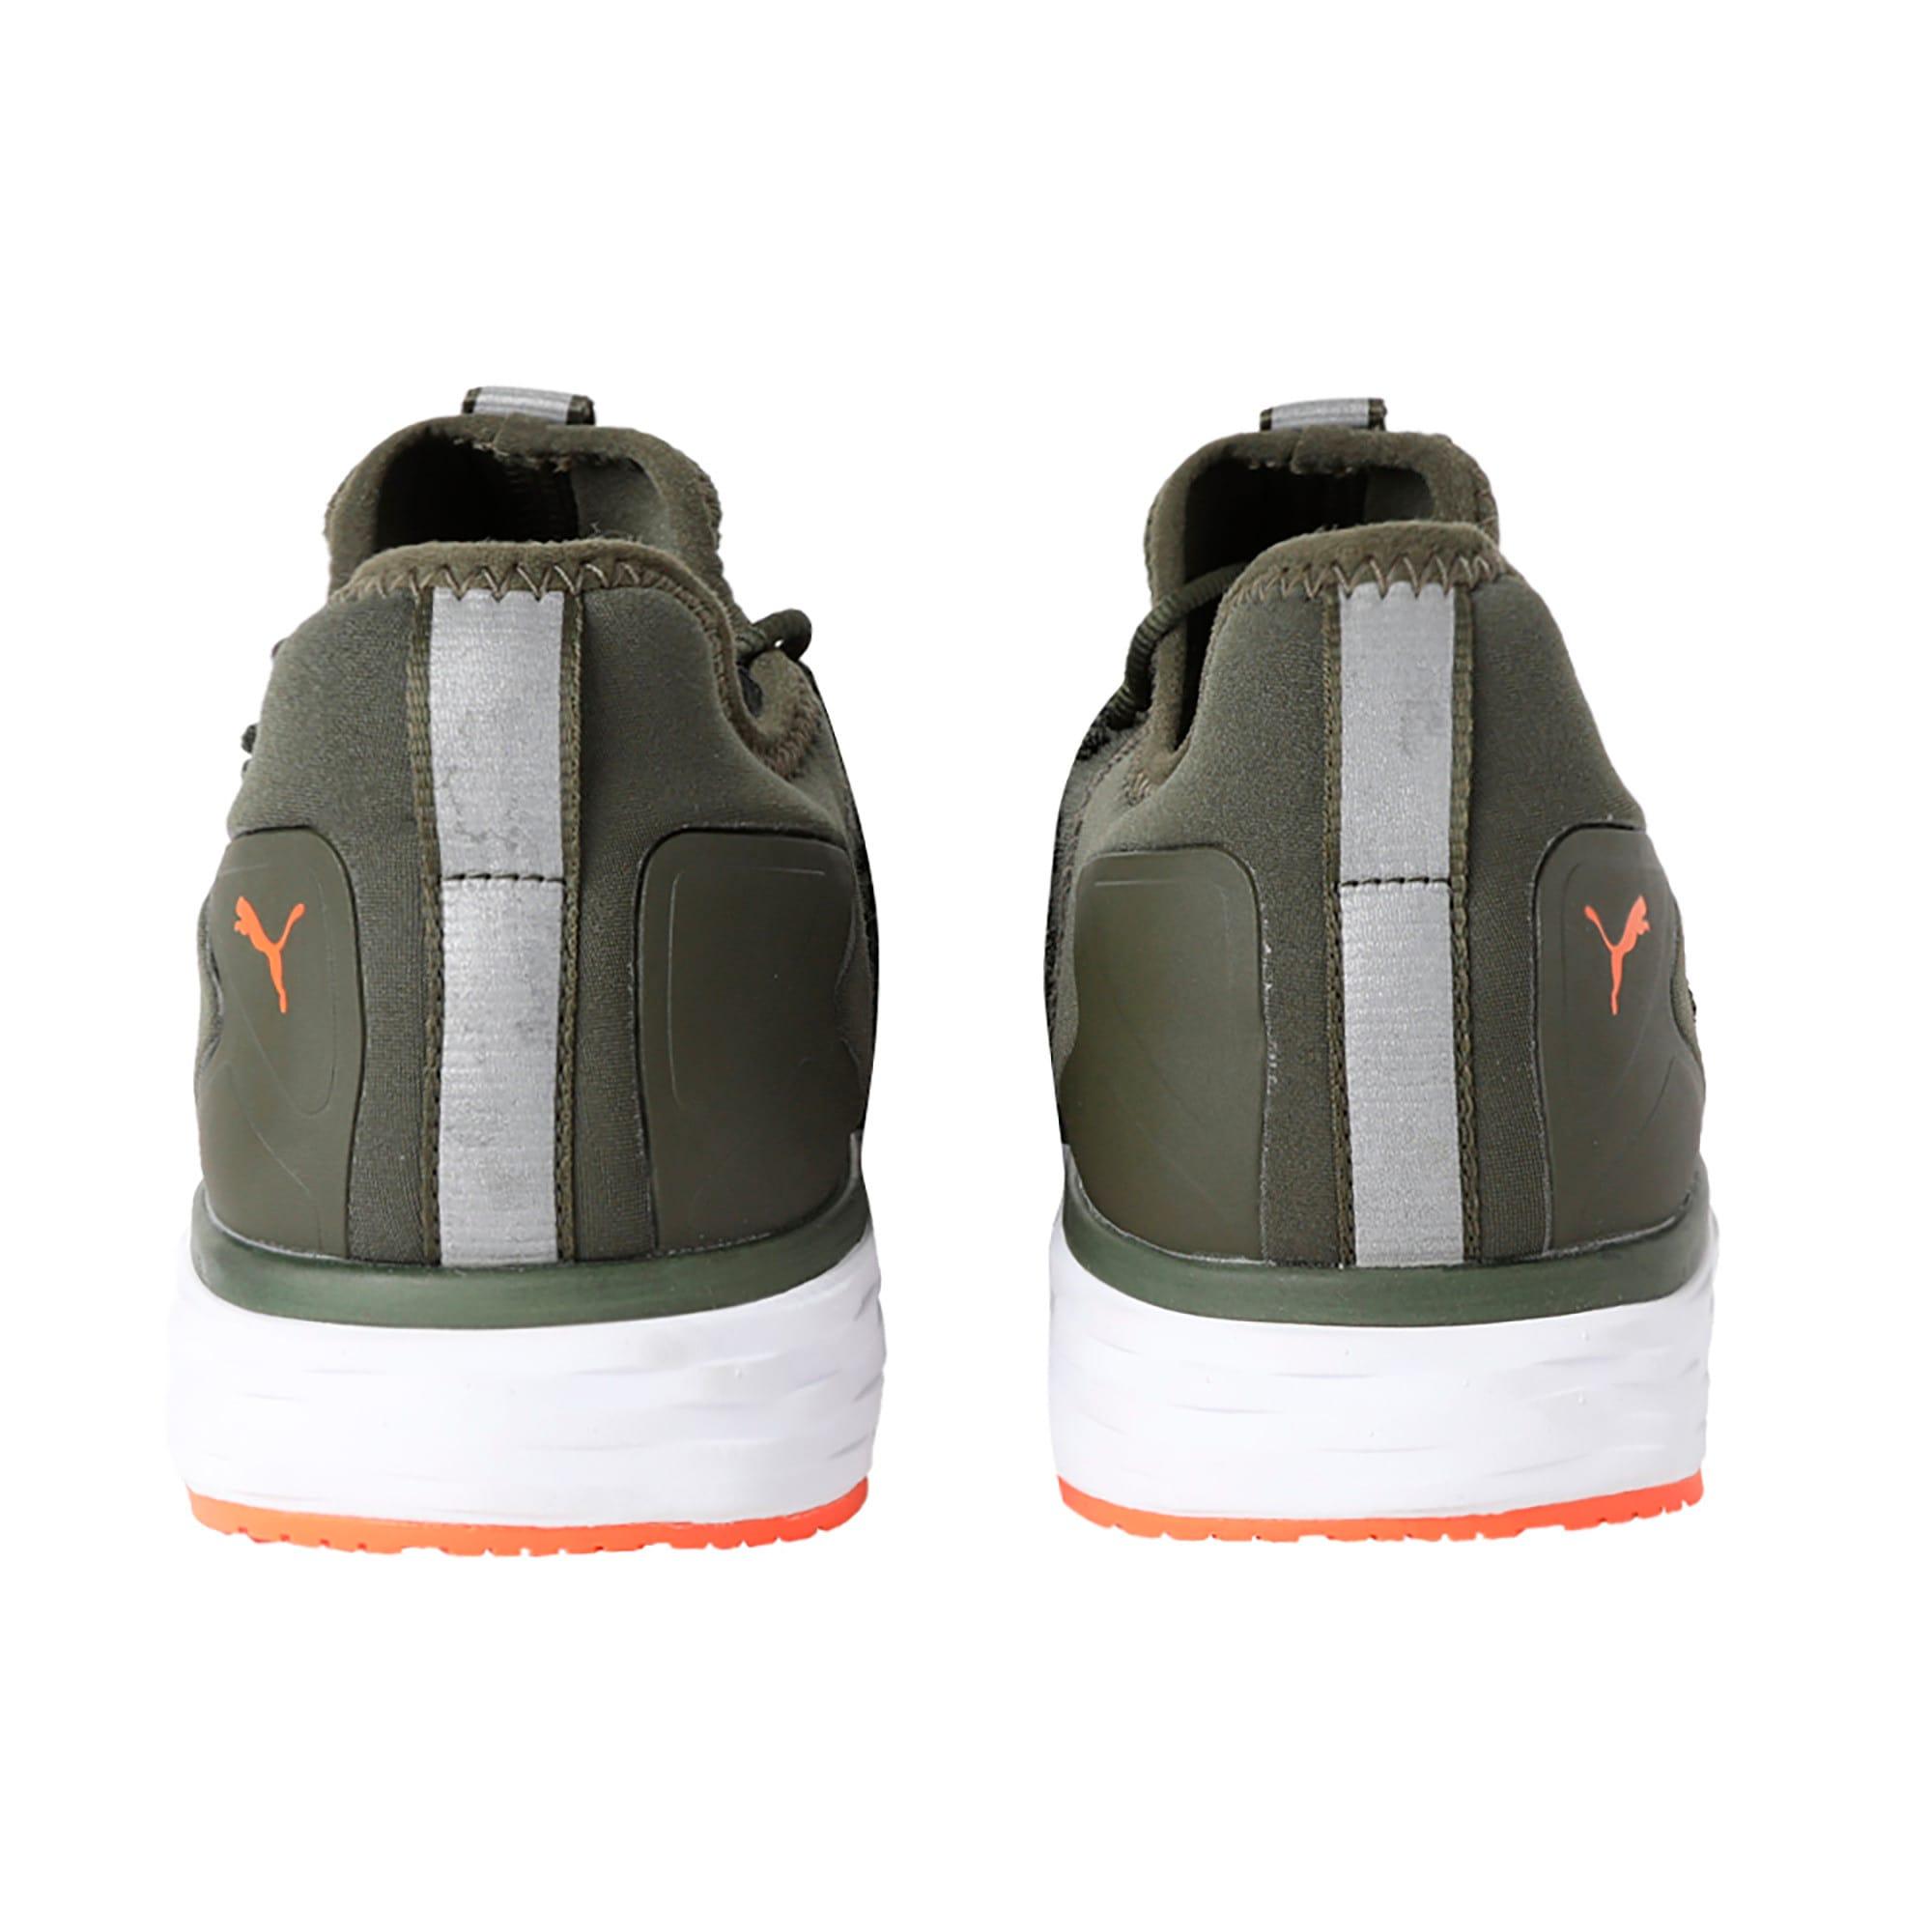 Thumbnail 3 of SPEED FUSEFIT Men's Running Shoes, Forest Night-Firecracker, medium-IND